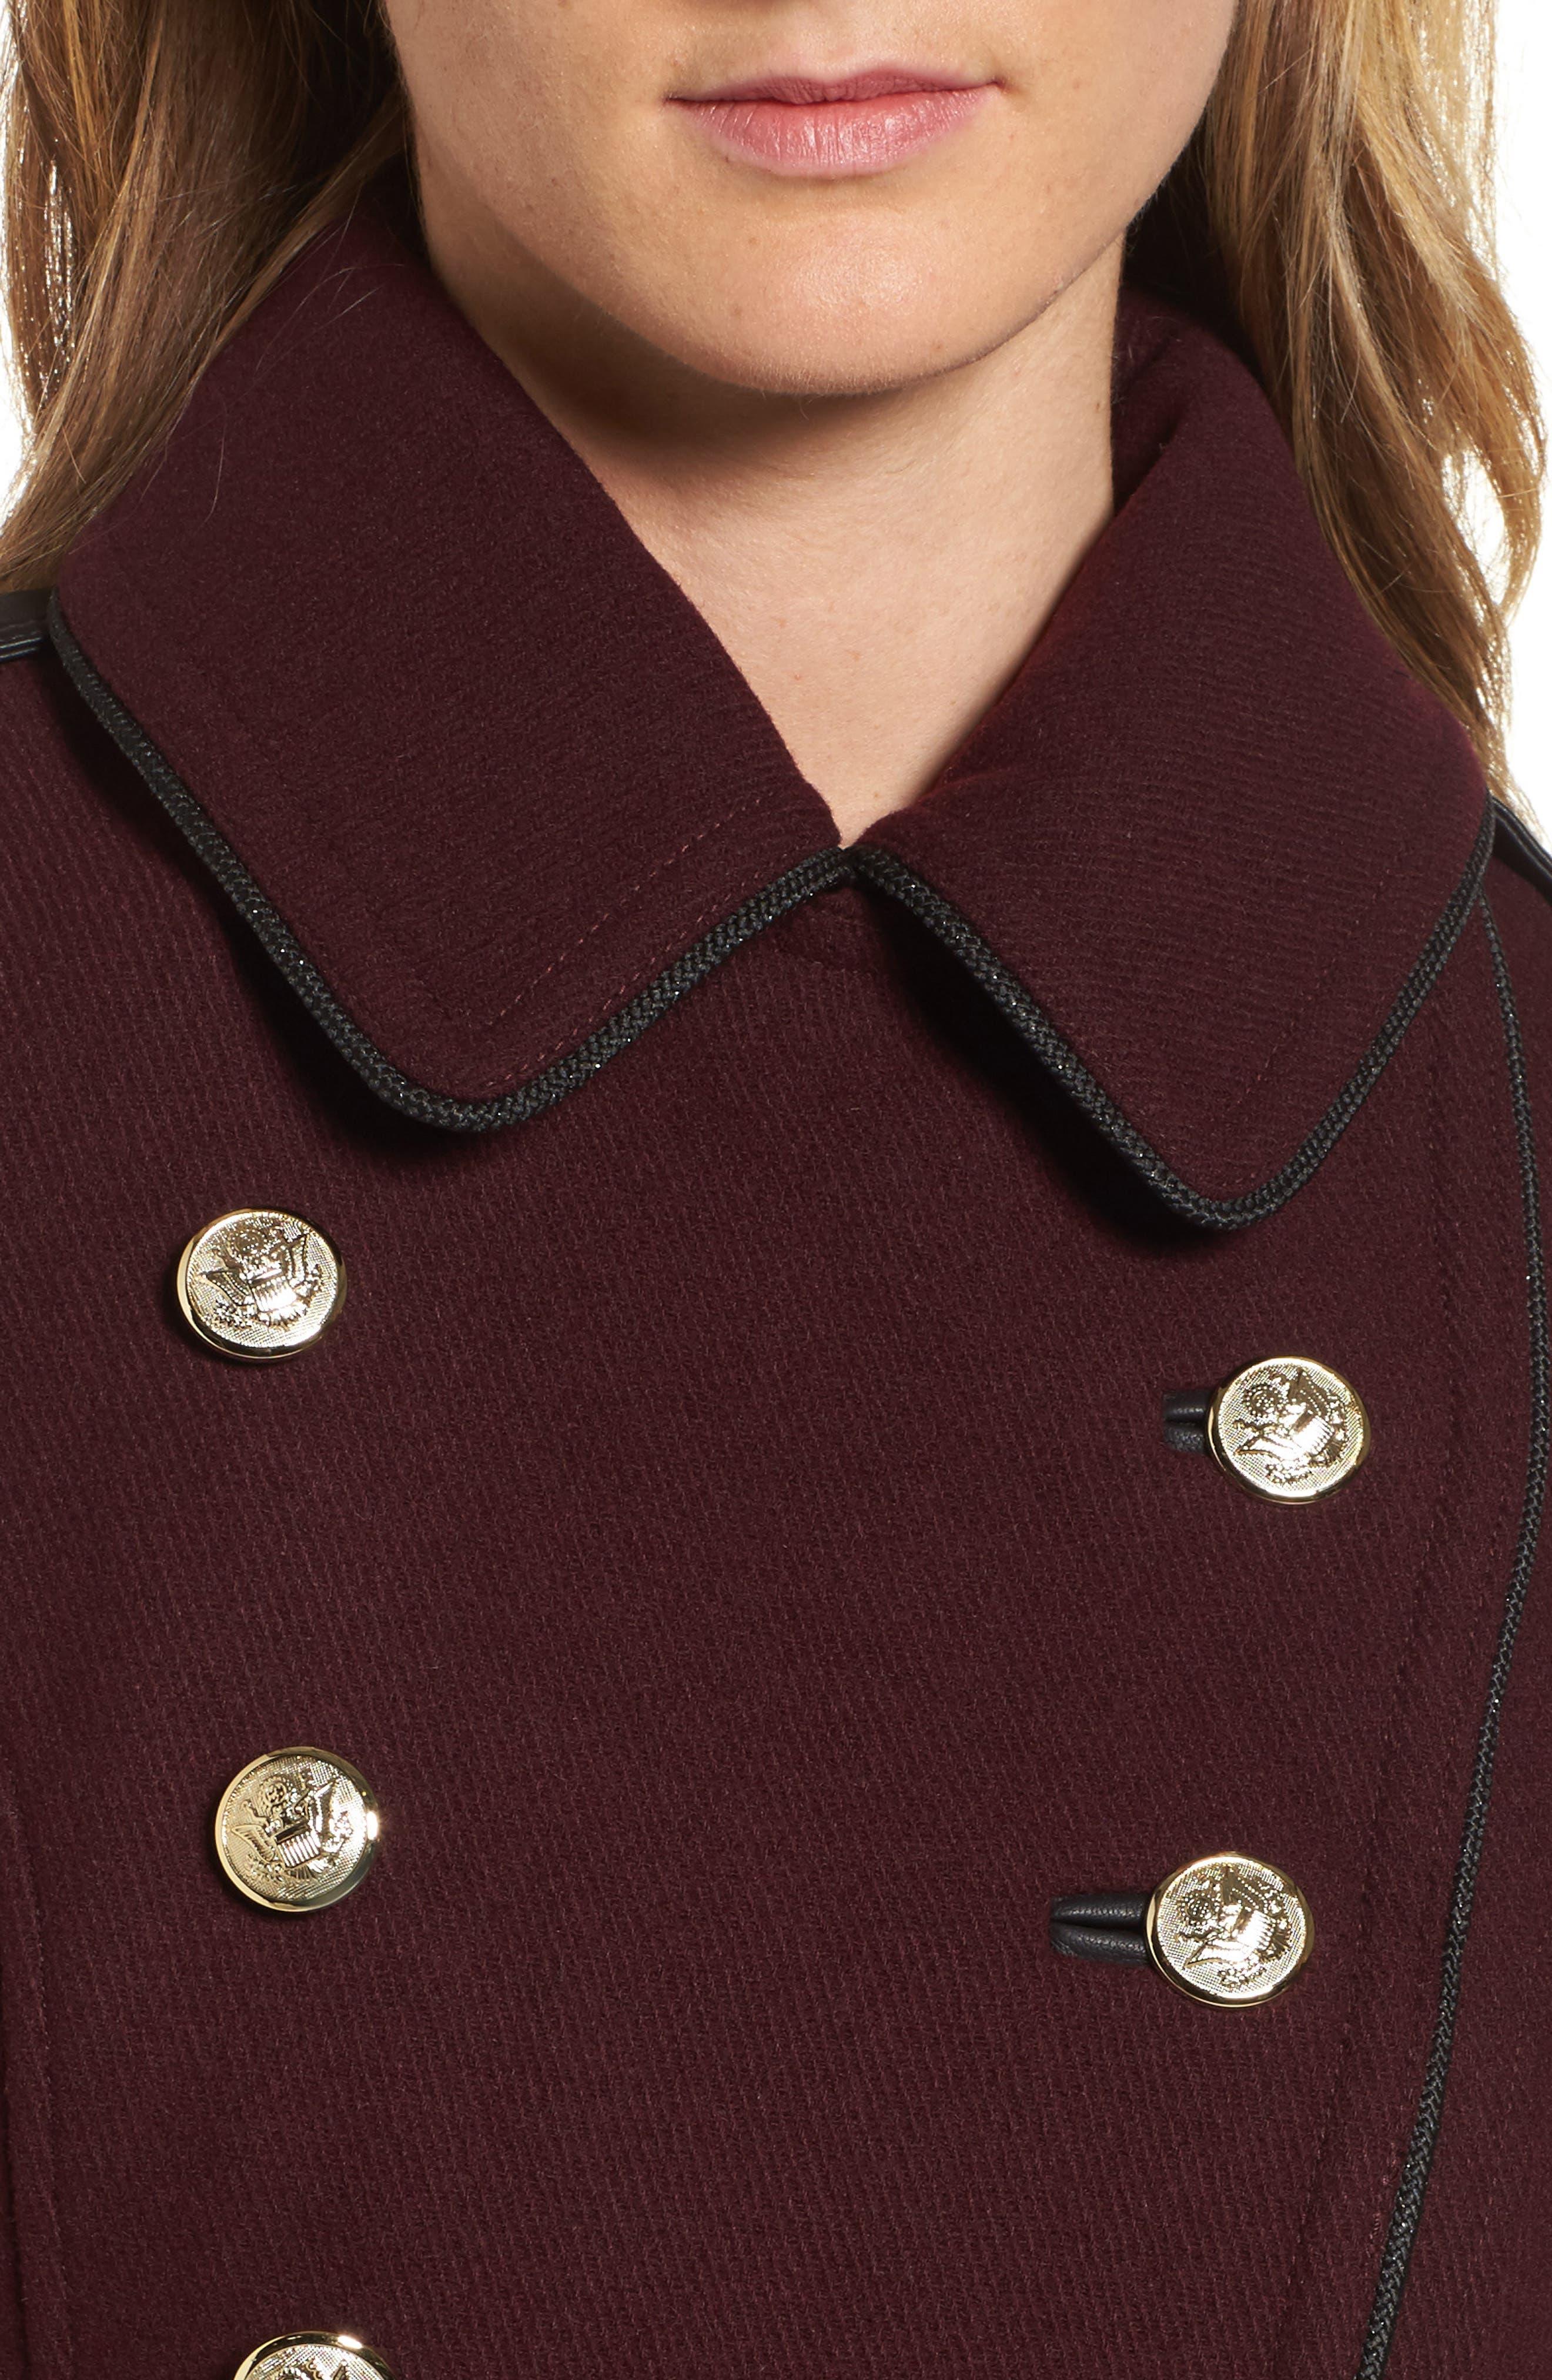 Wool Blend Military Coat,                             Alternate thumbnail 8, color,